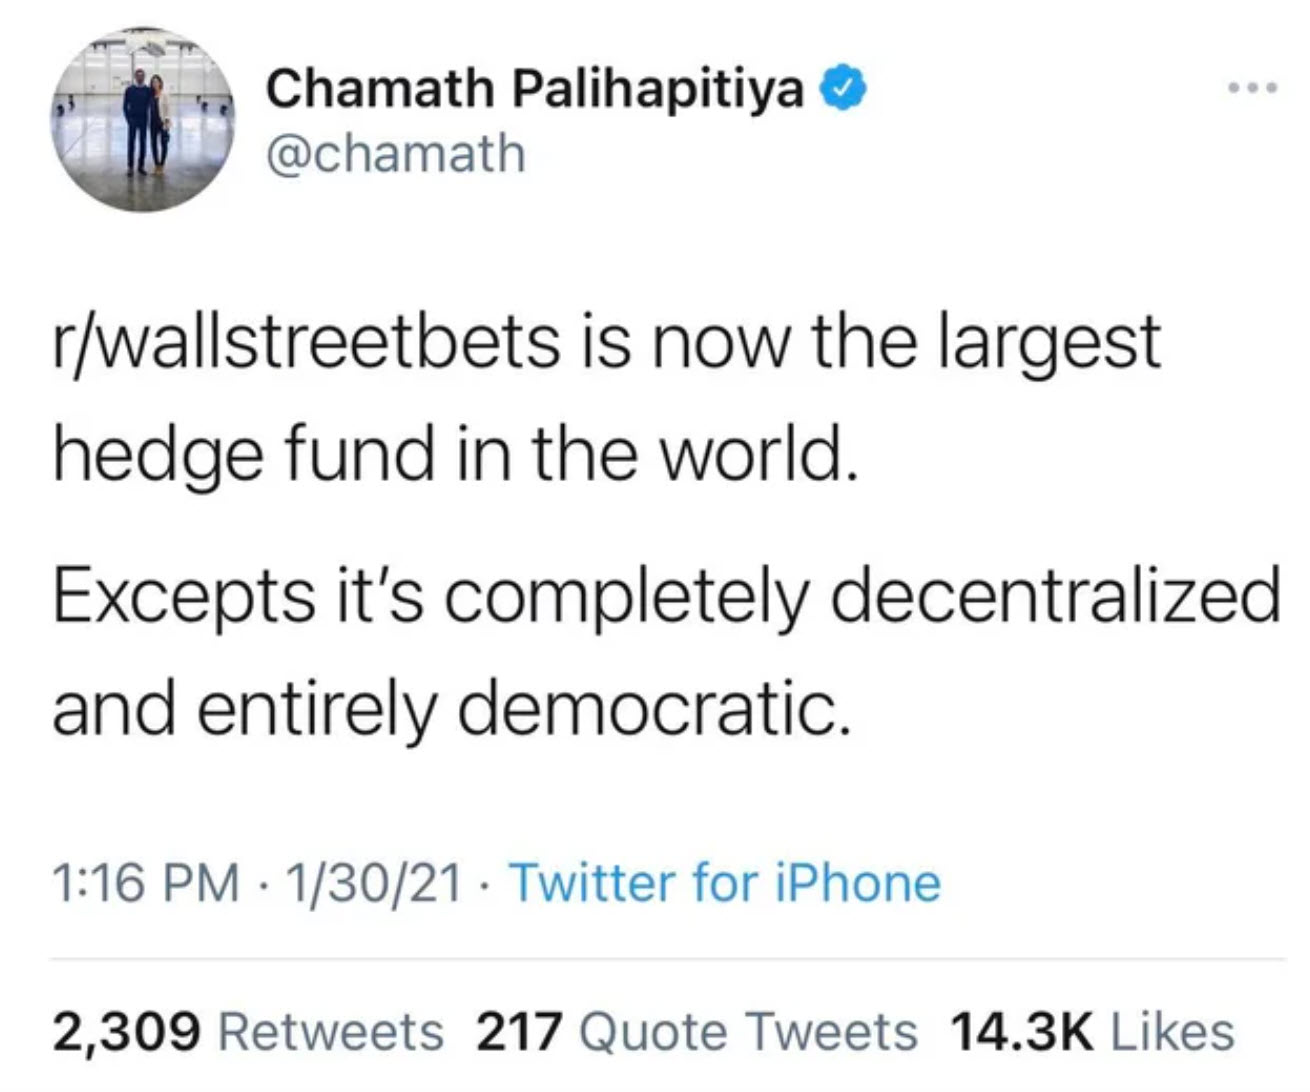 chamath tweet